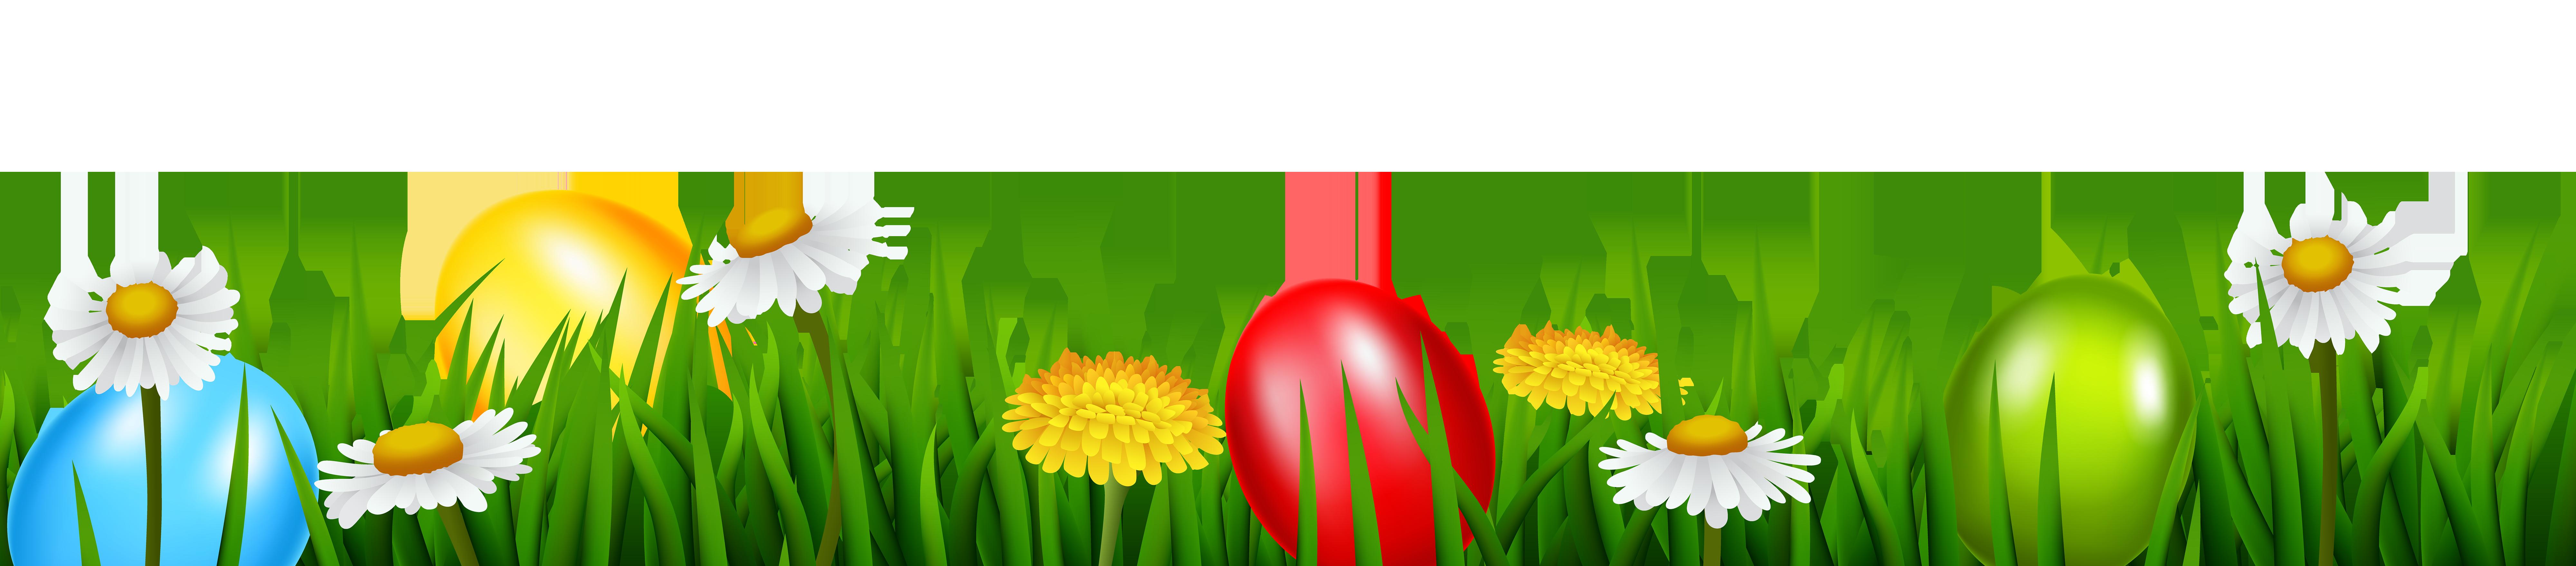 Easter Grass Transparent PNG Clip Art Image.